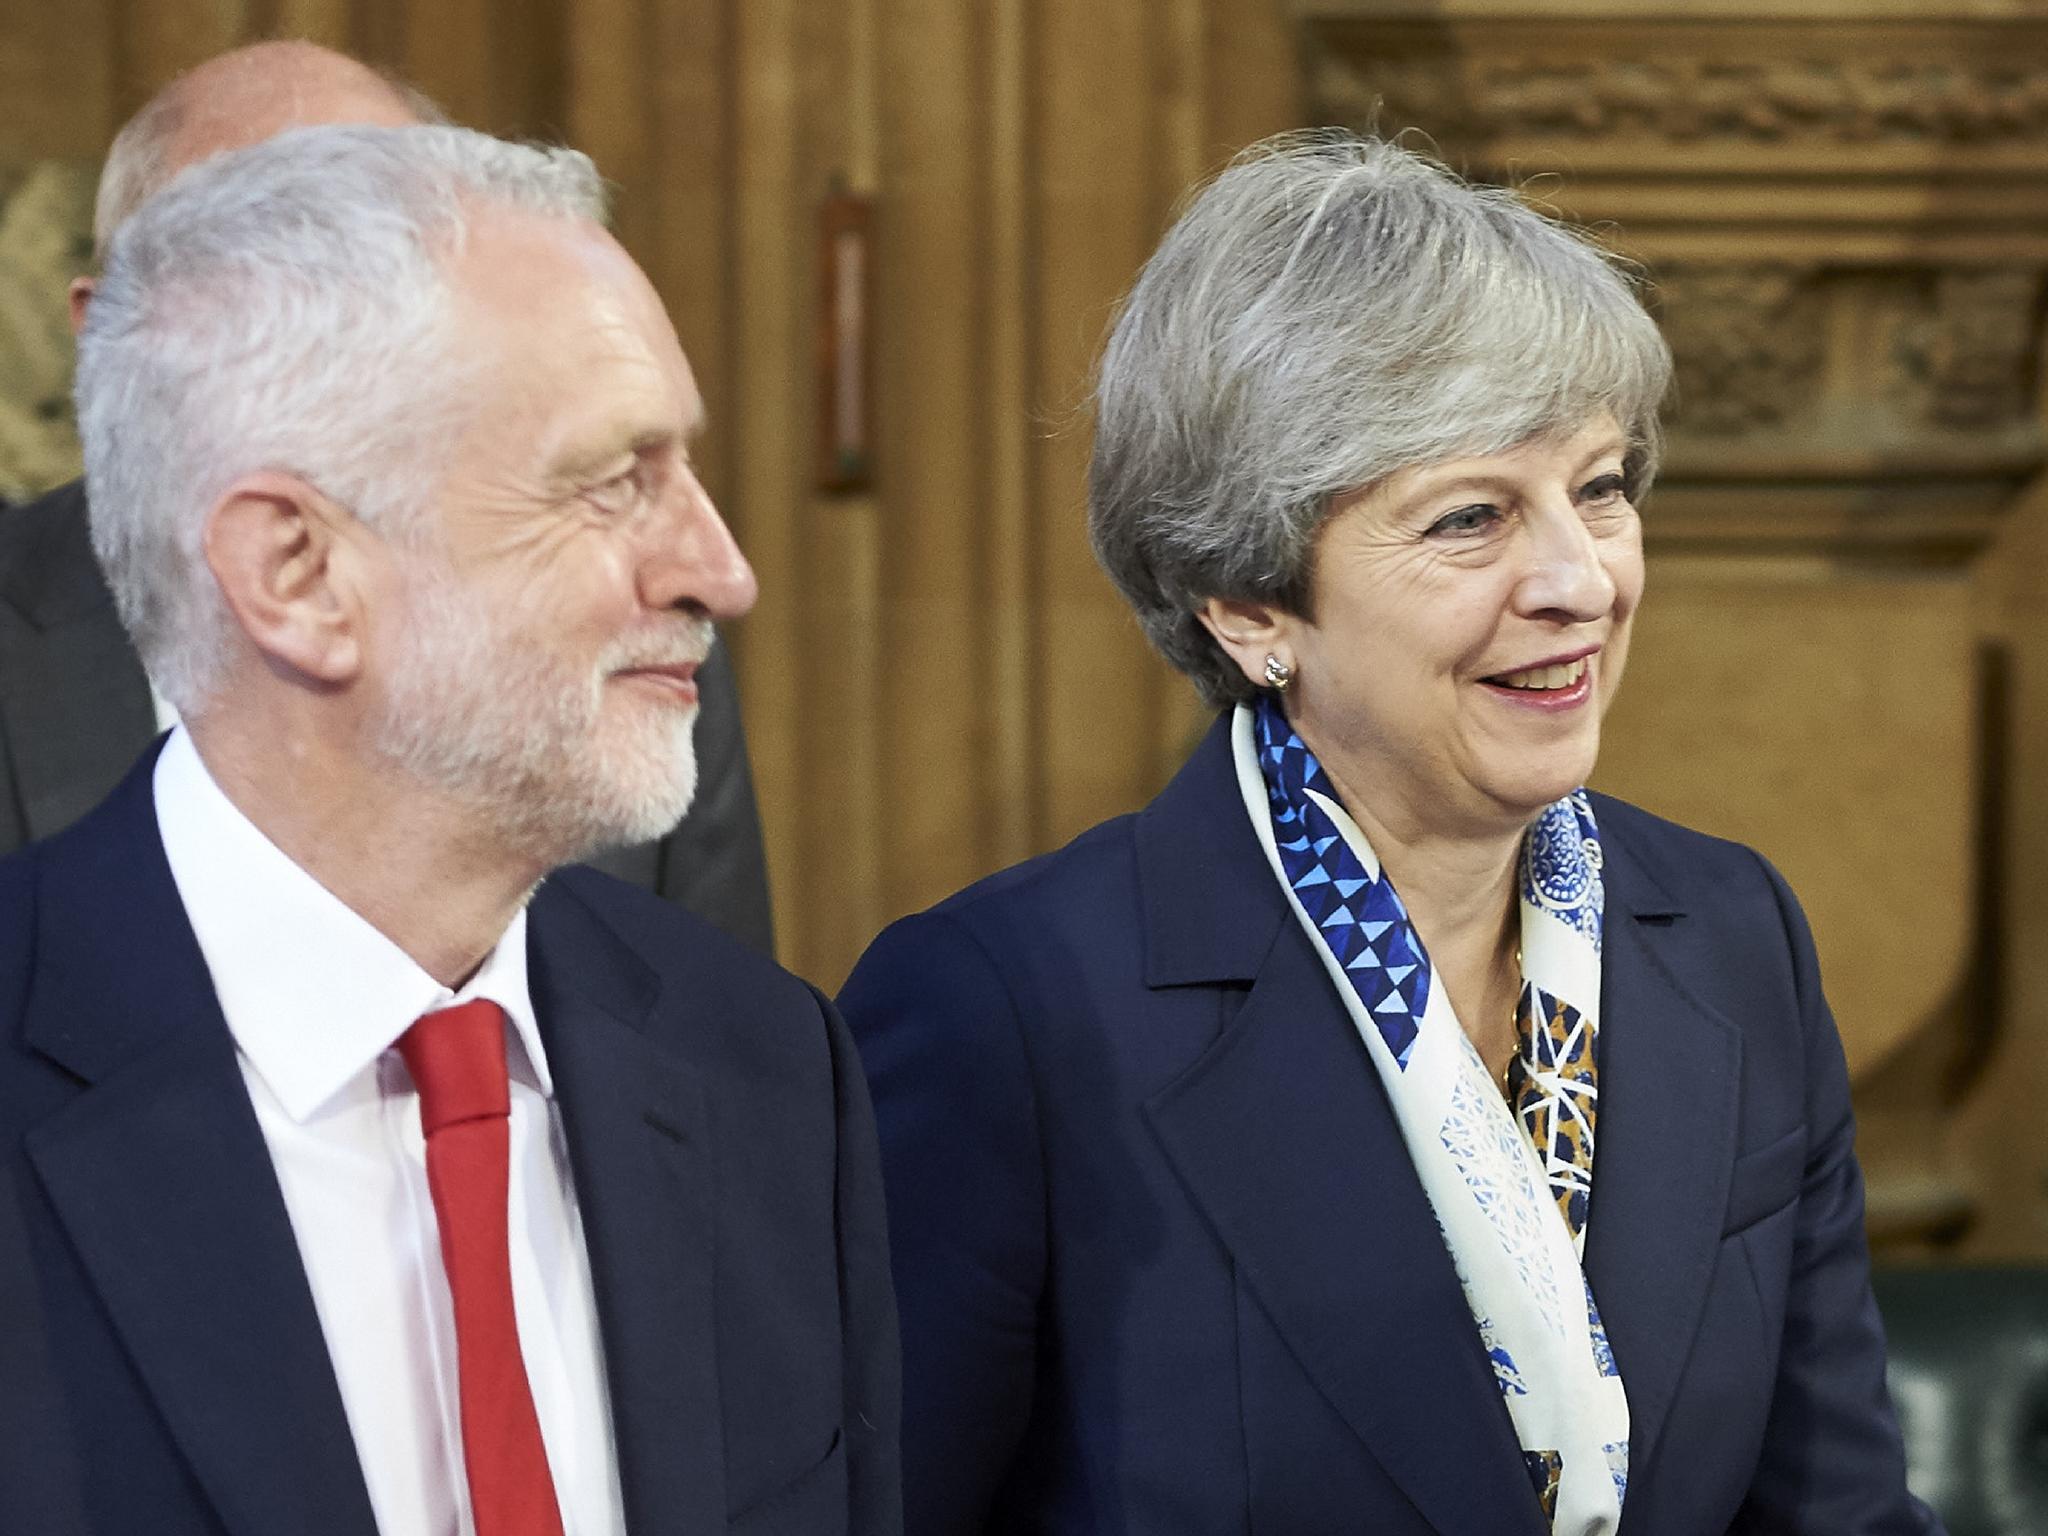 'Theresa May and Jeremy Corbyn are both backward-looking politicians'